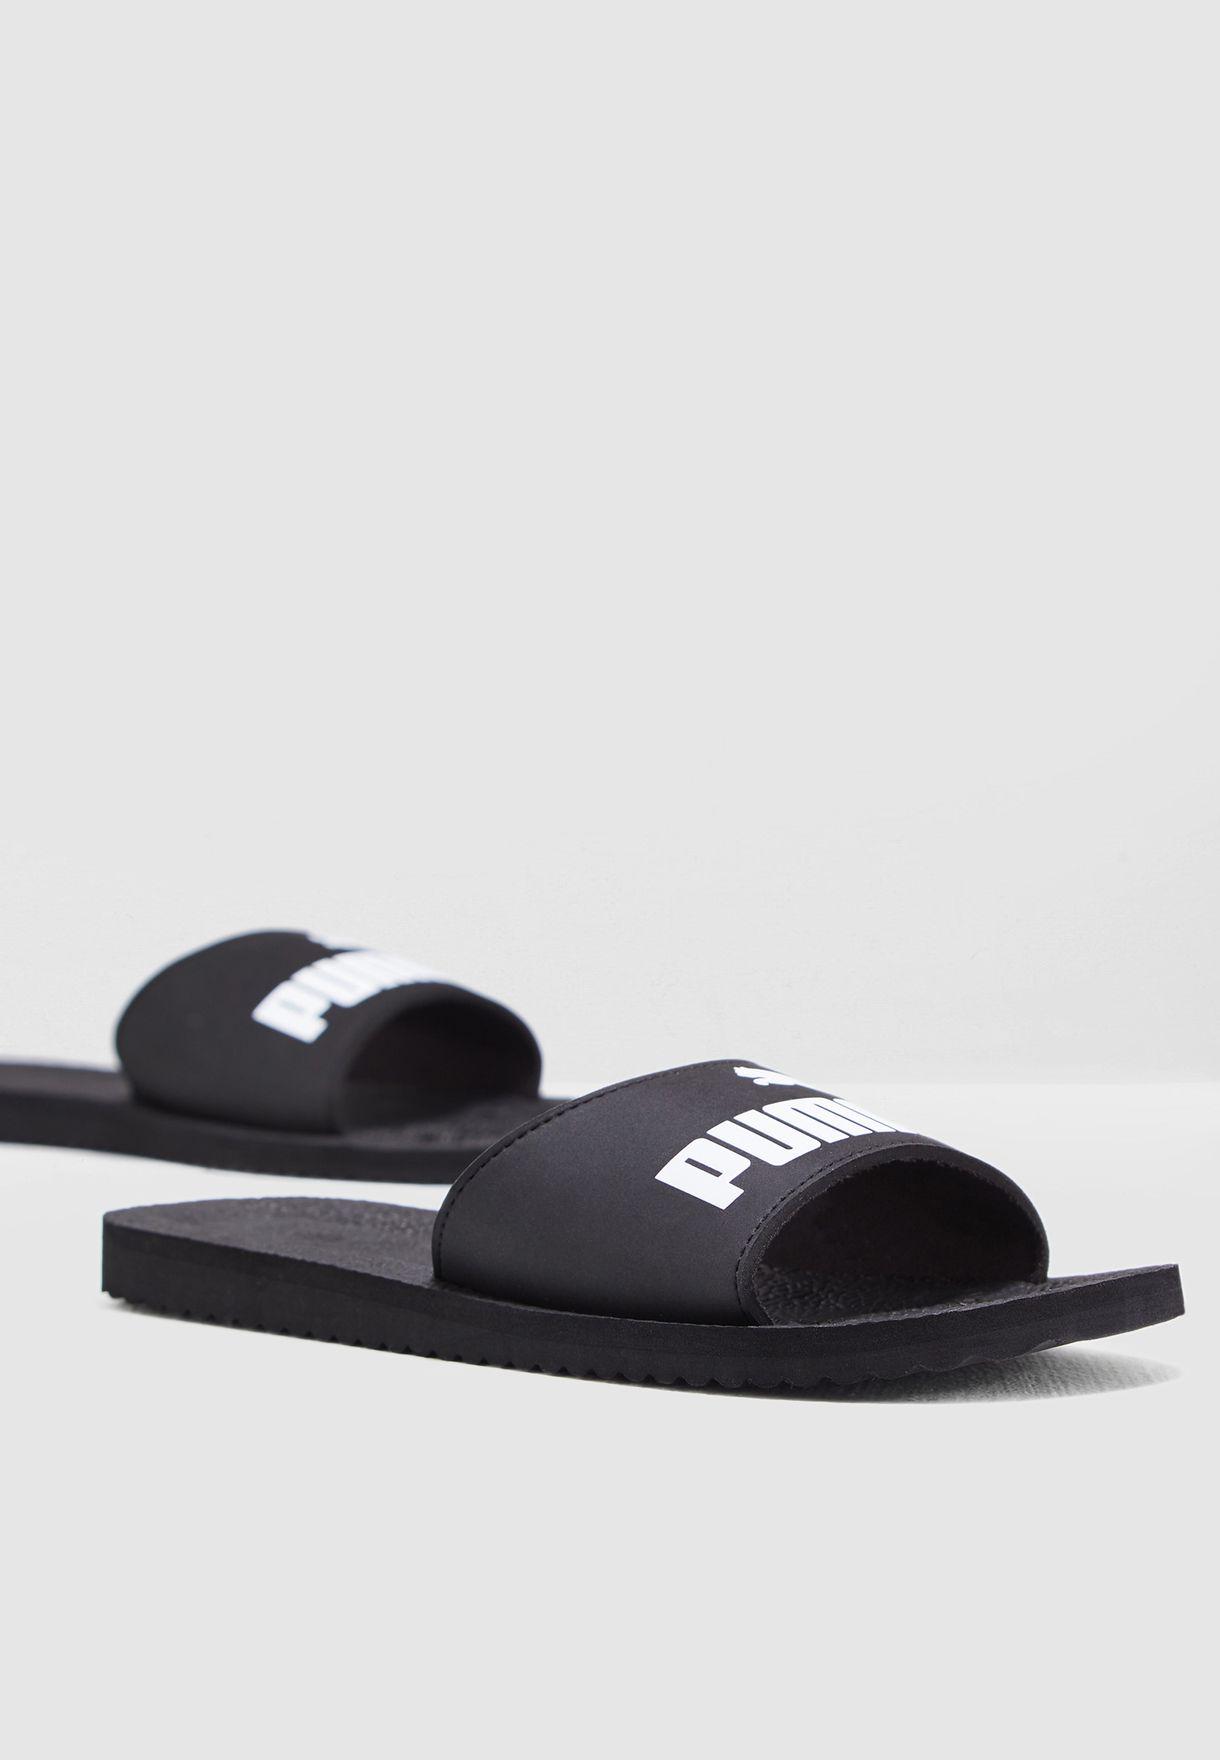 Purecat Slides